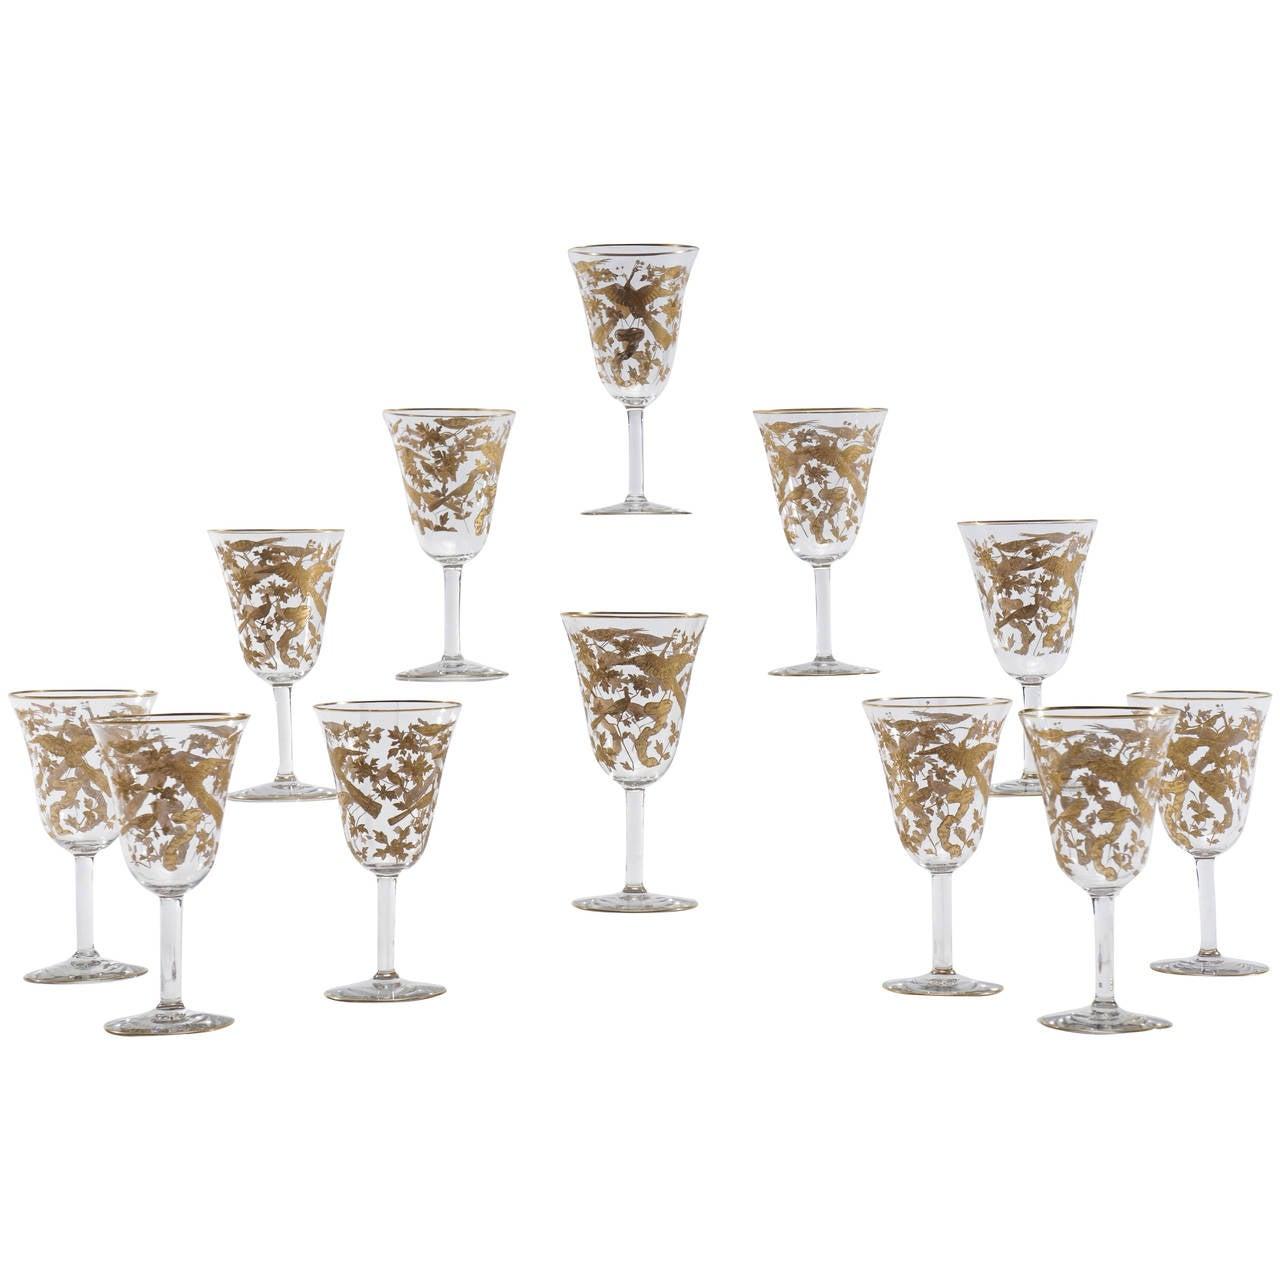 12 baccarat crystal wine goblets intaglio cut with gilded. Black Bedroom Furniture Sets. Home Design Ideas